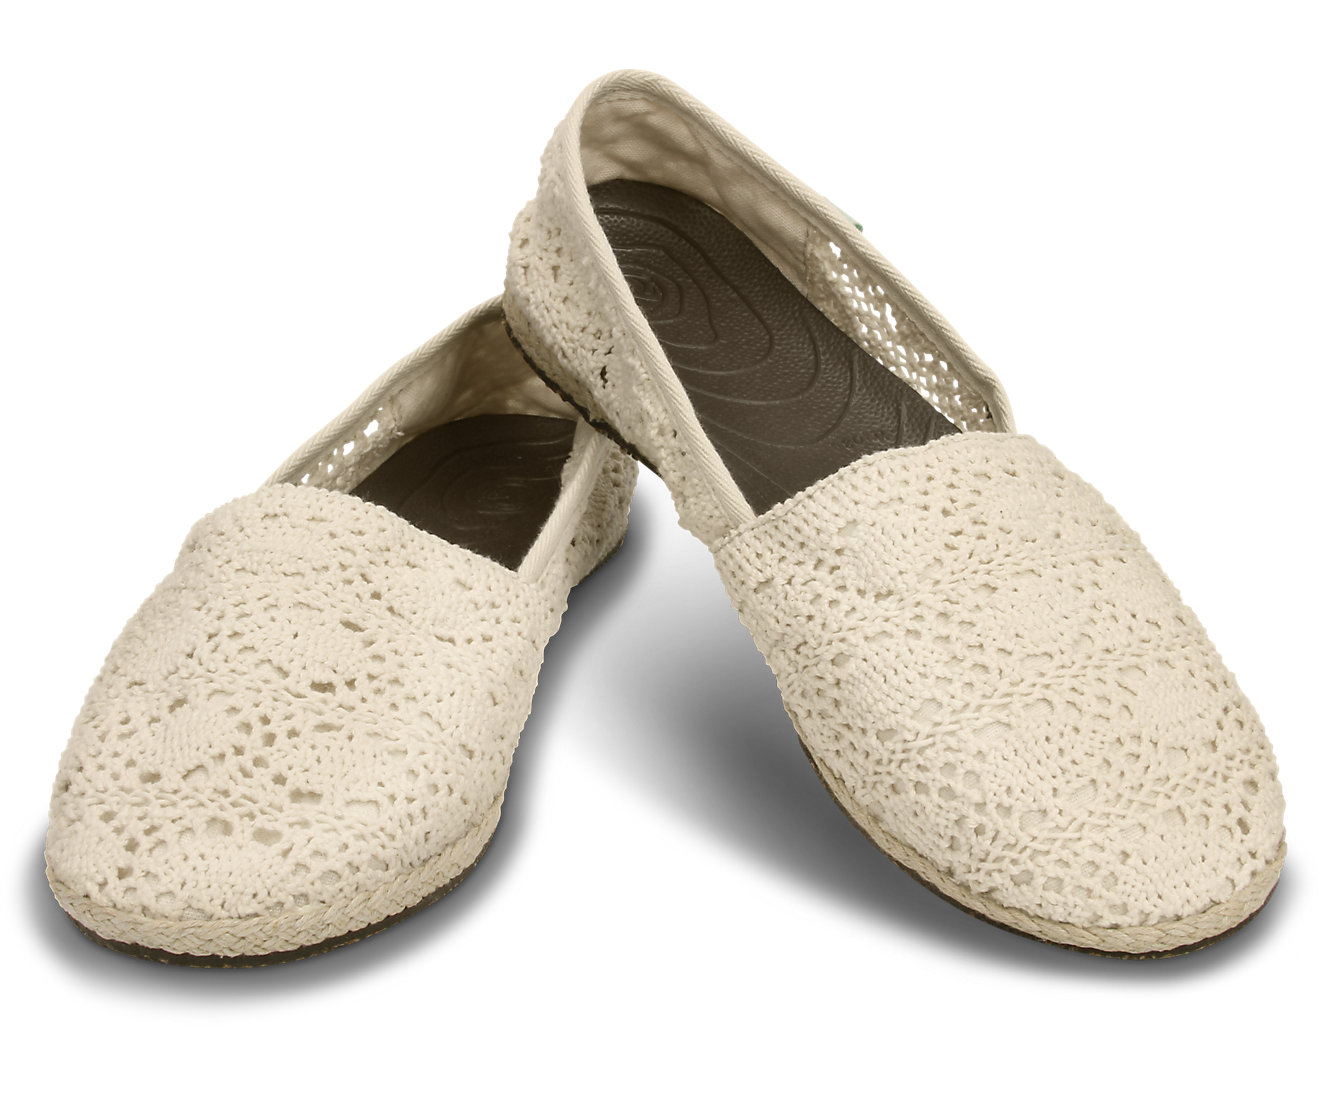 ef19d6ea3148 Ocean Minded™ Women s Espadrilla Crochet Slip-on